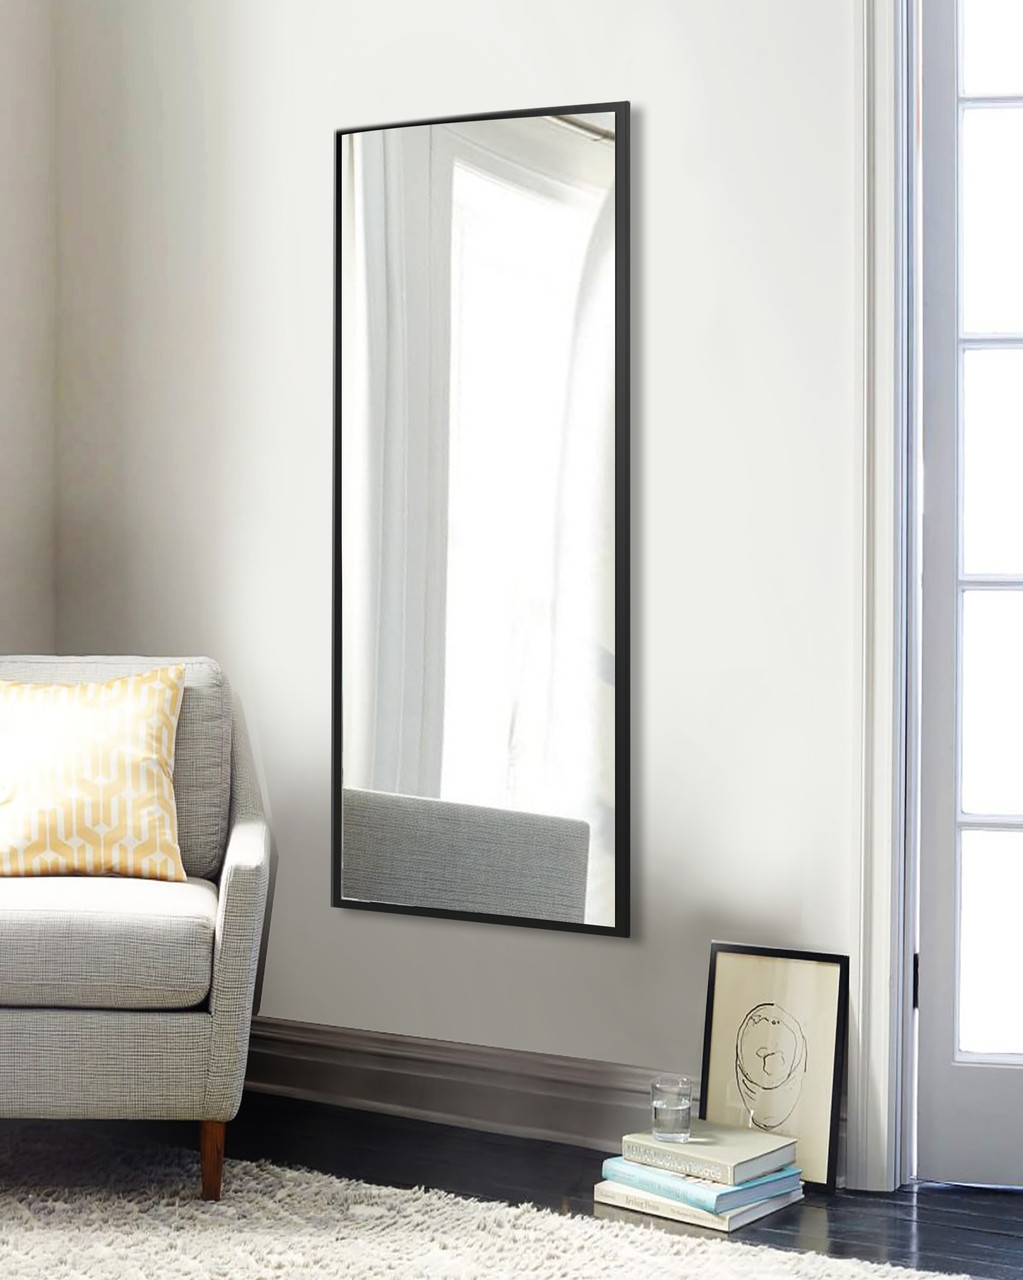 Зеркало прямоугольное черное 1300 х 600 мм | Дзеркало прямокутне, чорне 1300 х 600 мм